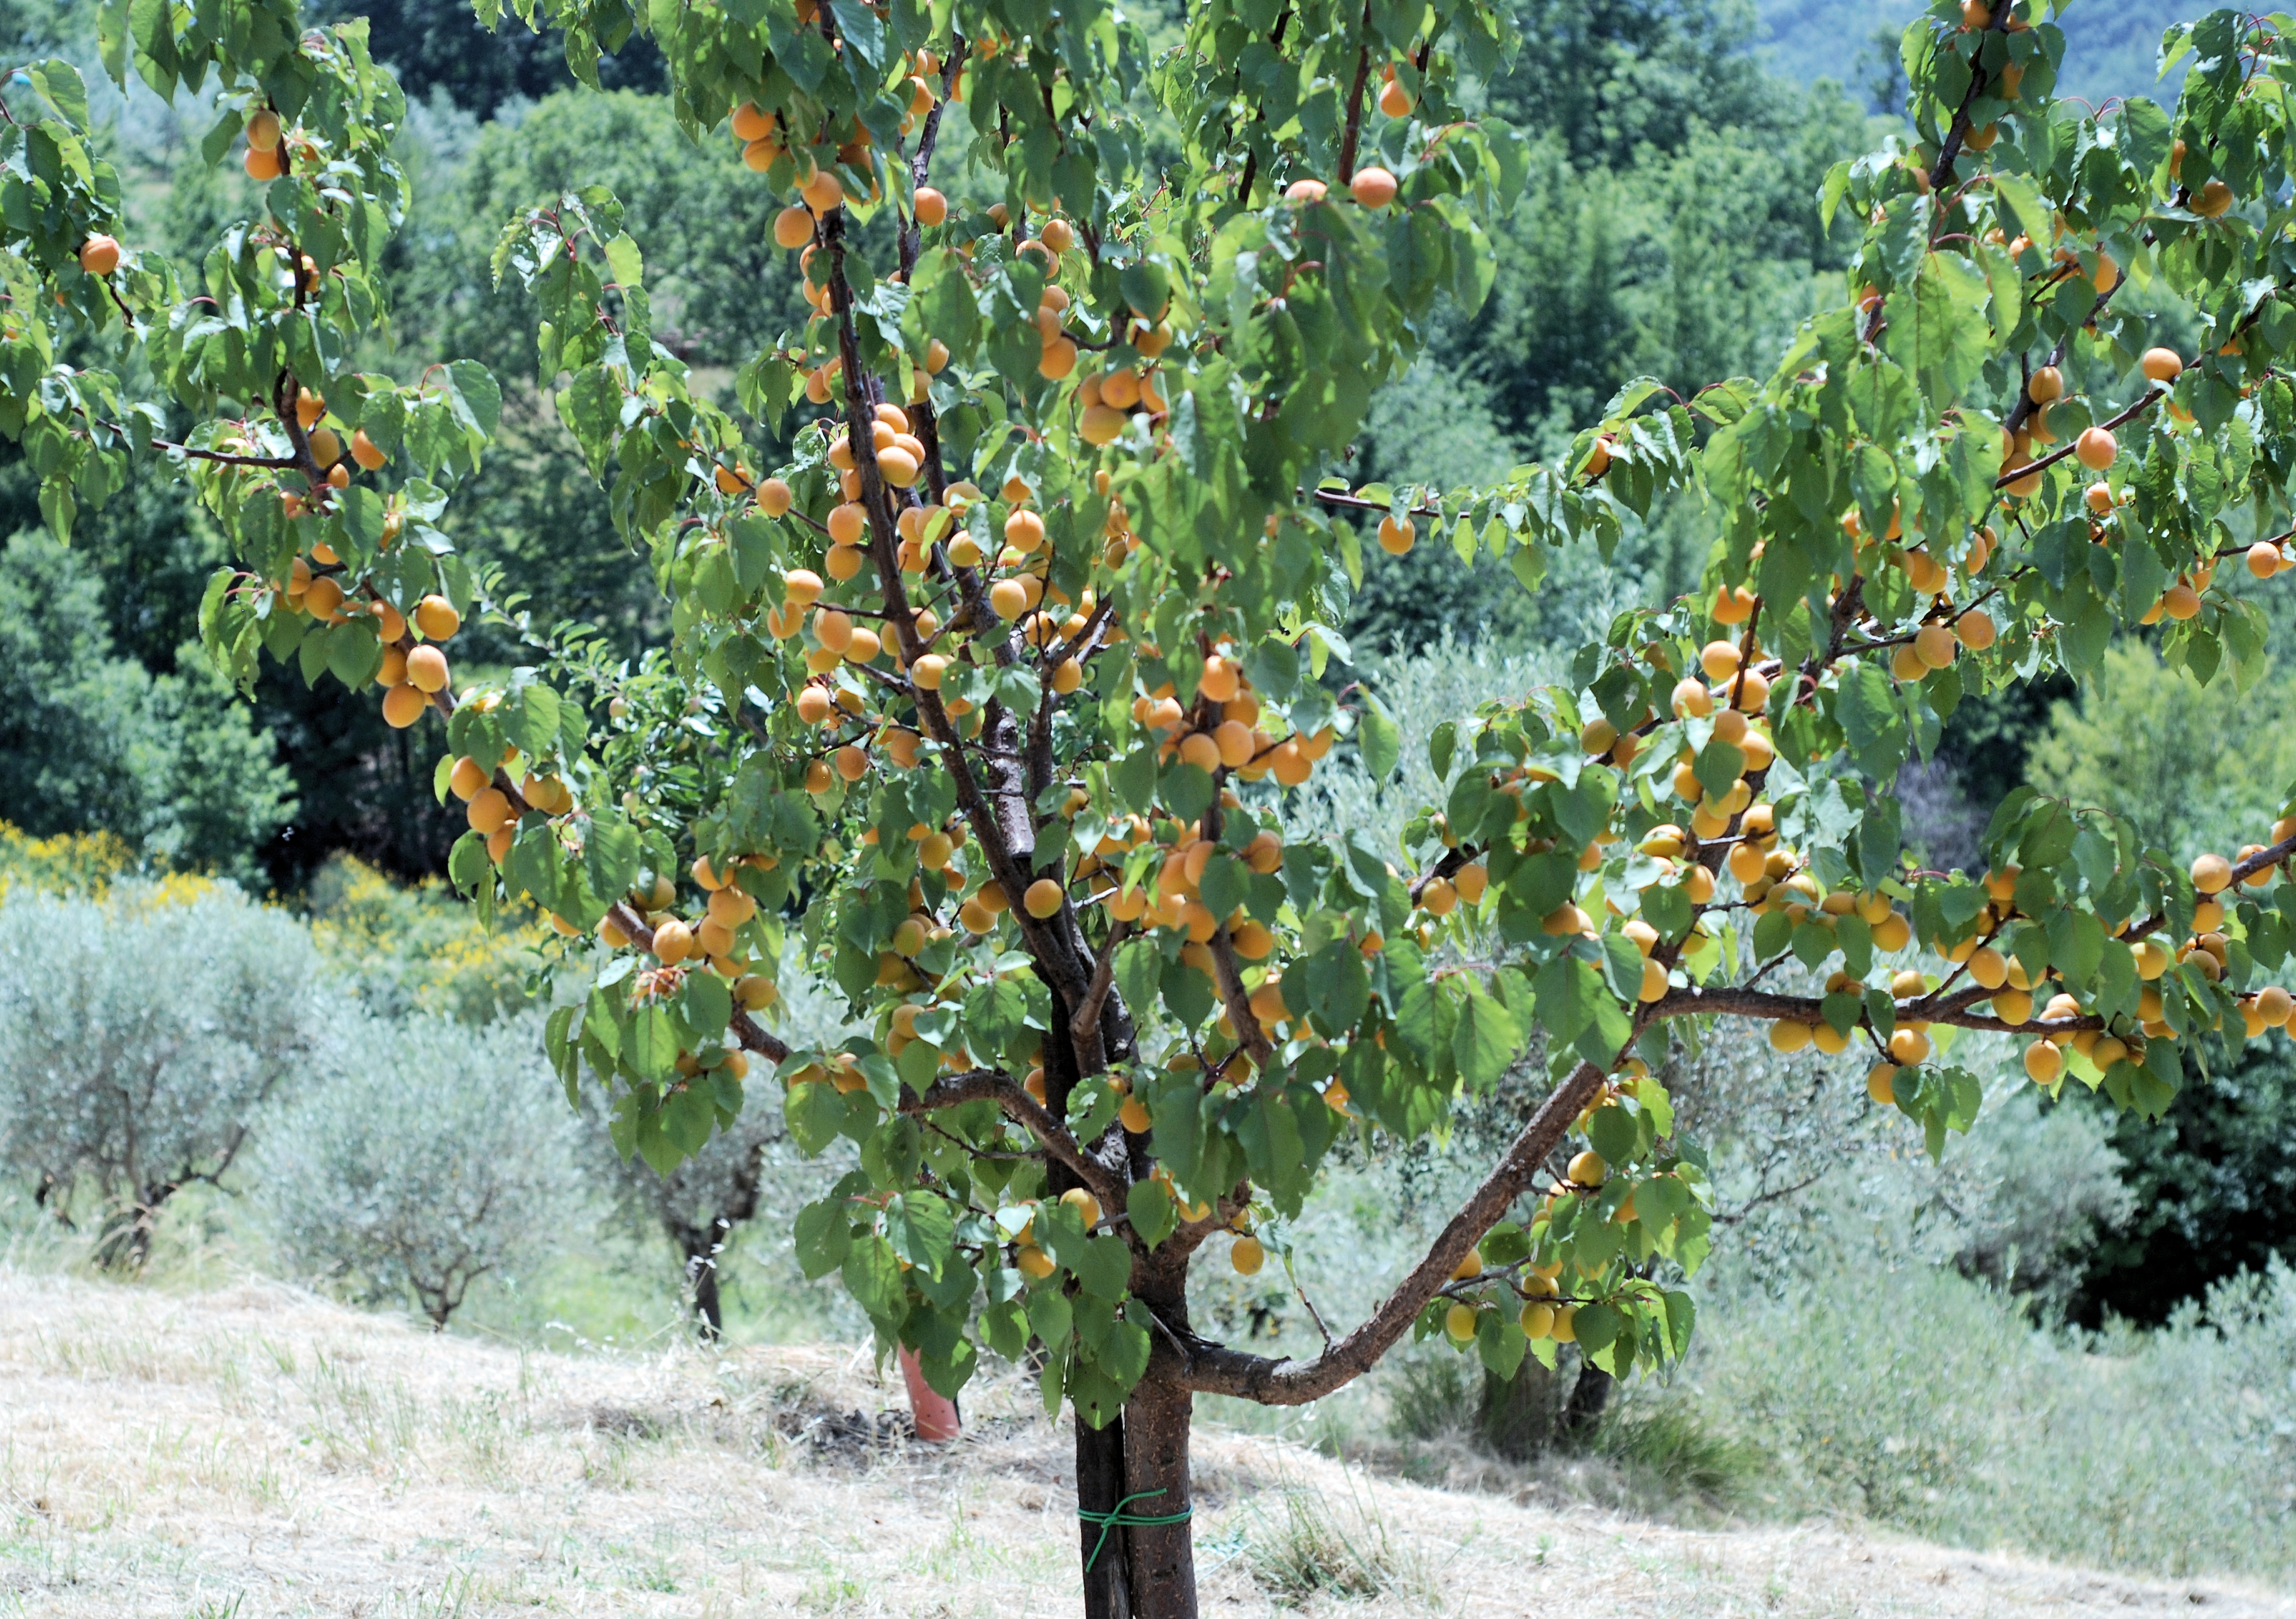 High Resolution Wallpaper   Apricot Tree 3654x2577 px